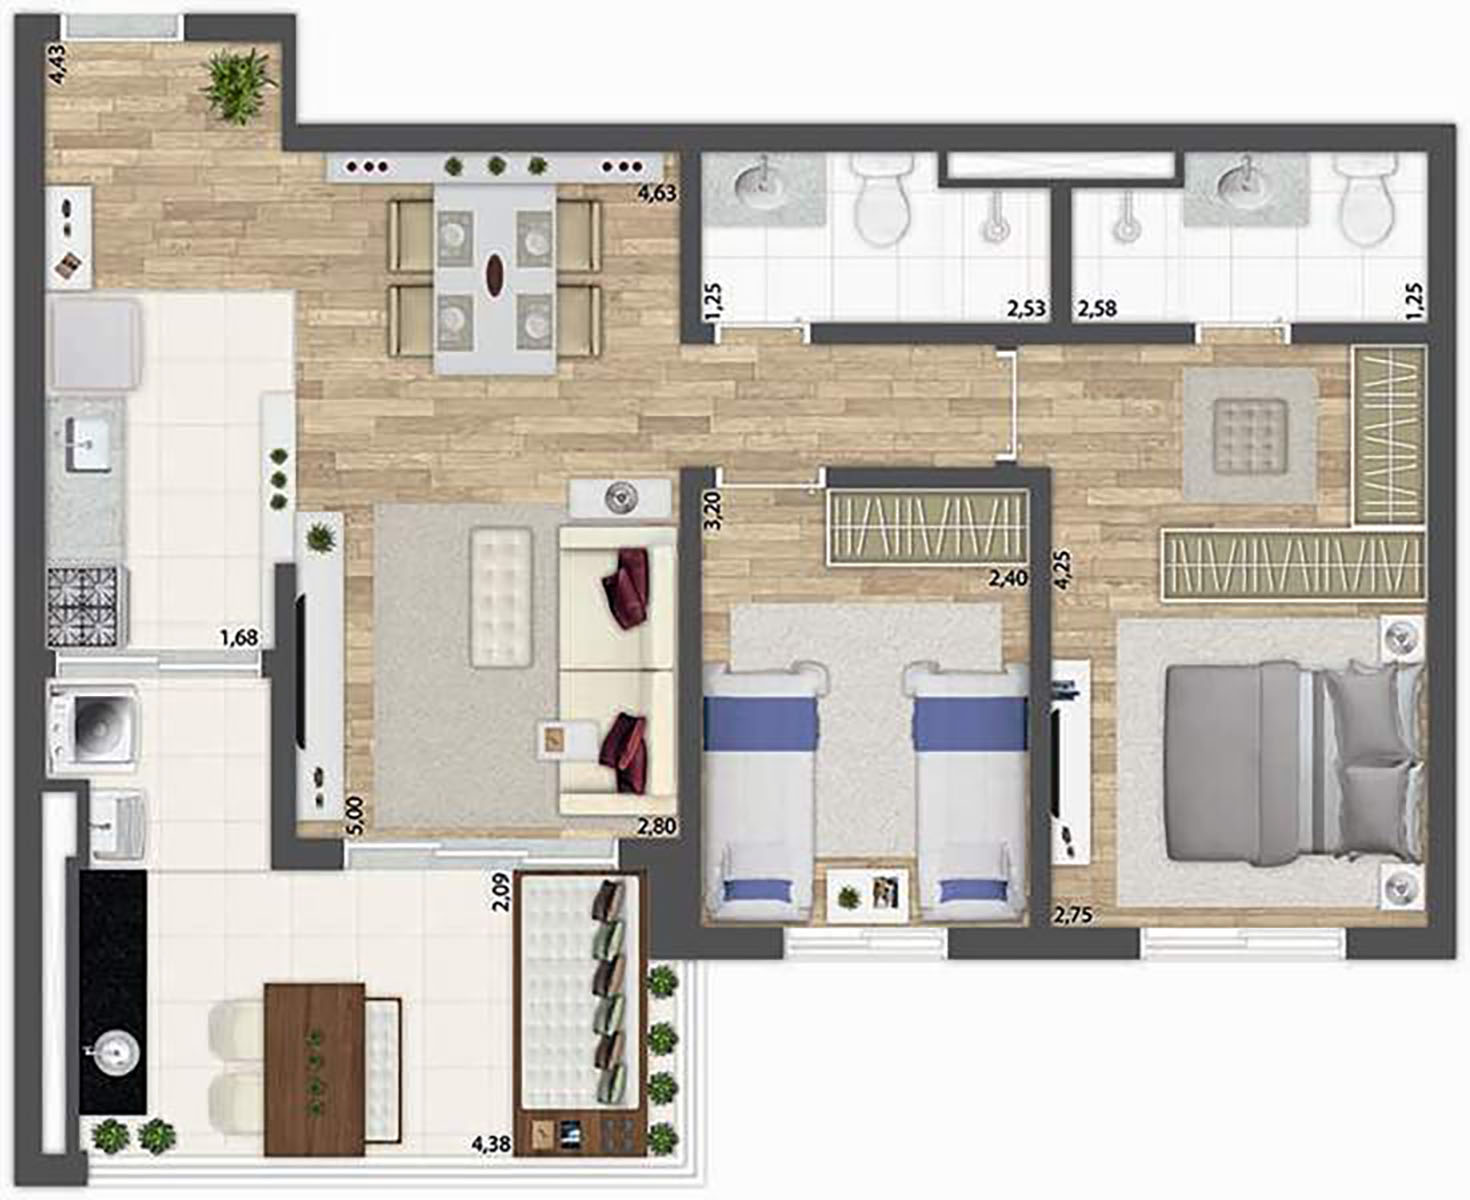 71 m² - 2 dormitórios  O2 Jardim Sul